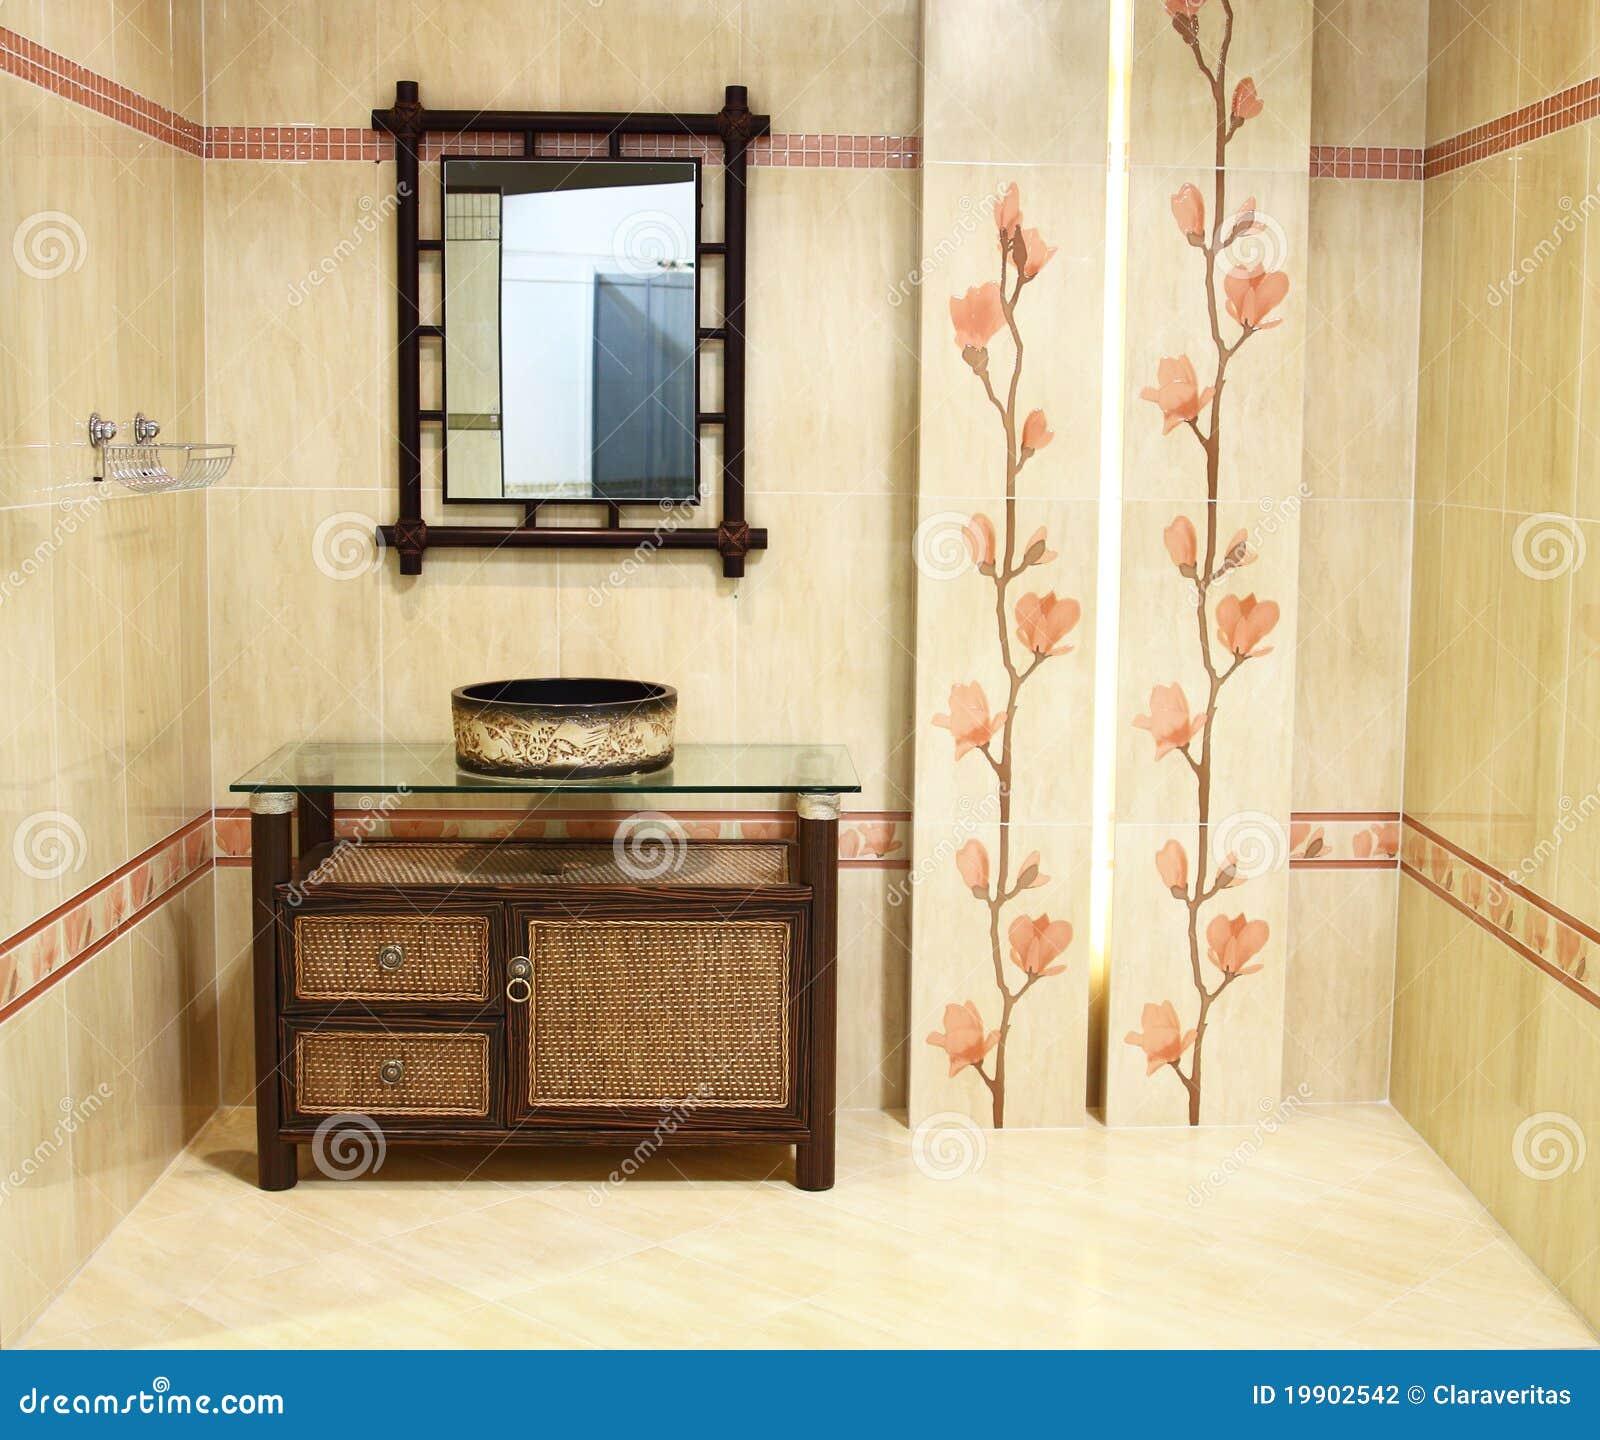 Interior of bathroom iii stock photography image 19902542 for Bathroom interior images